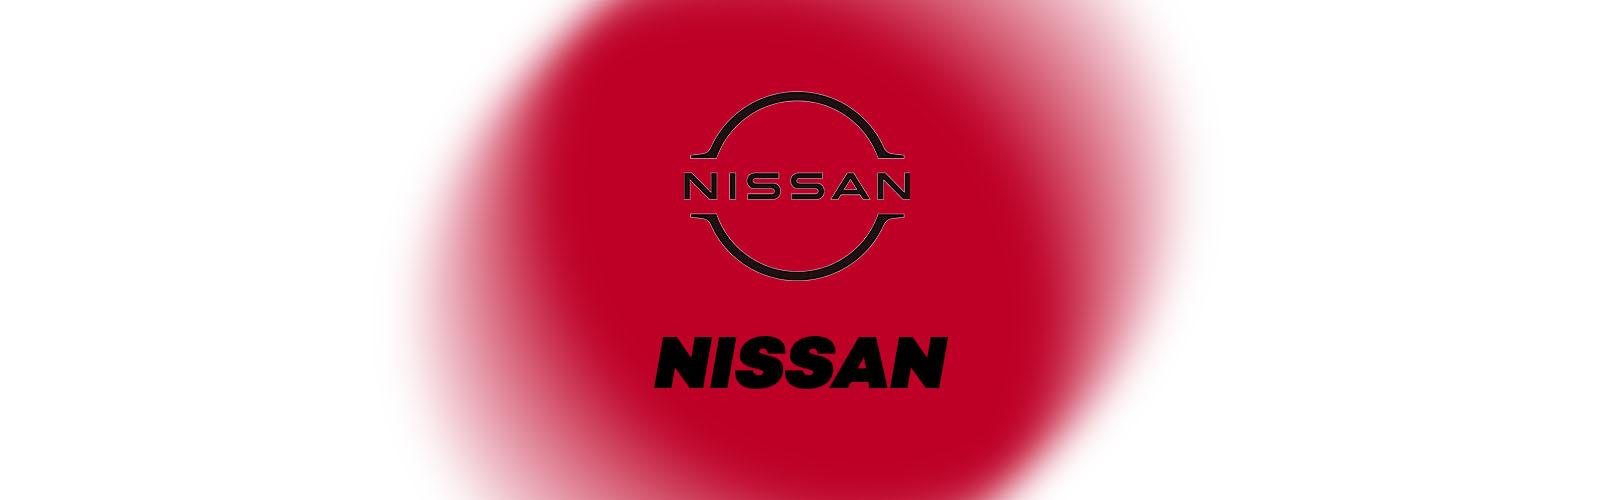 Nissan logo marque